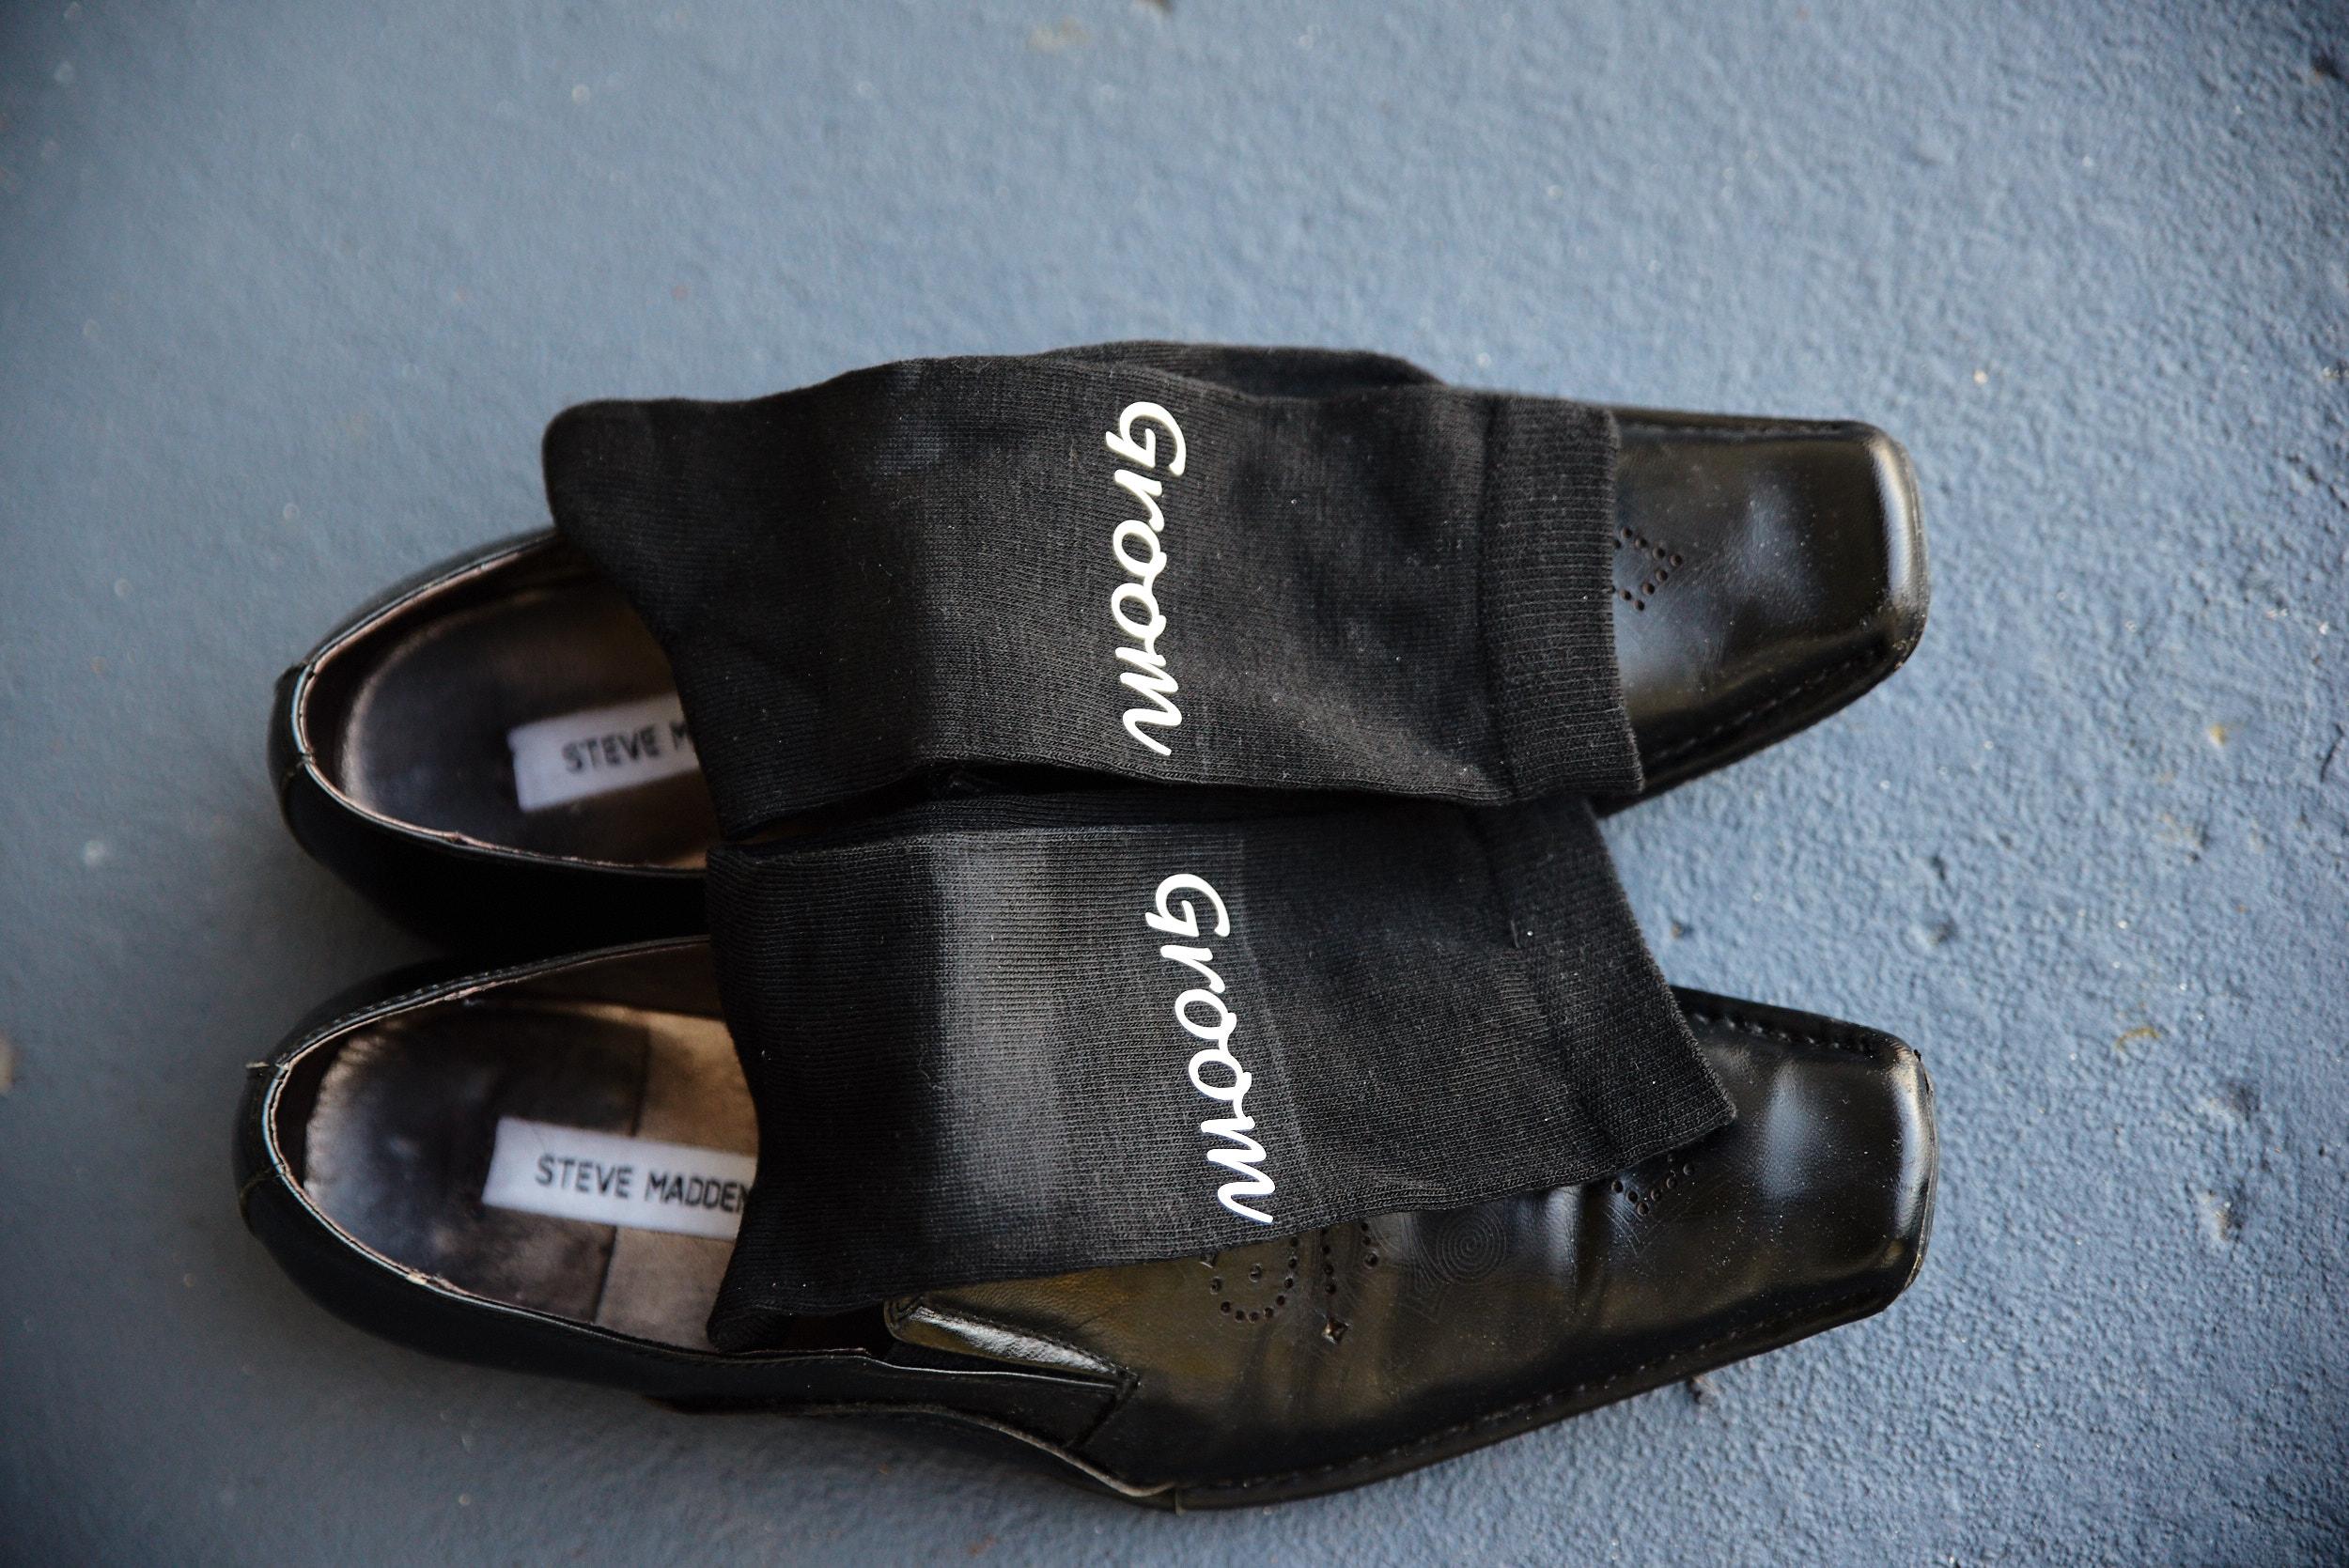 Groom's shoes and socks